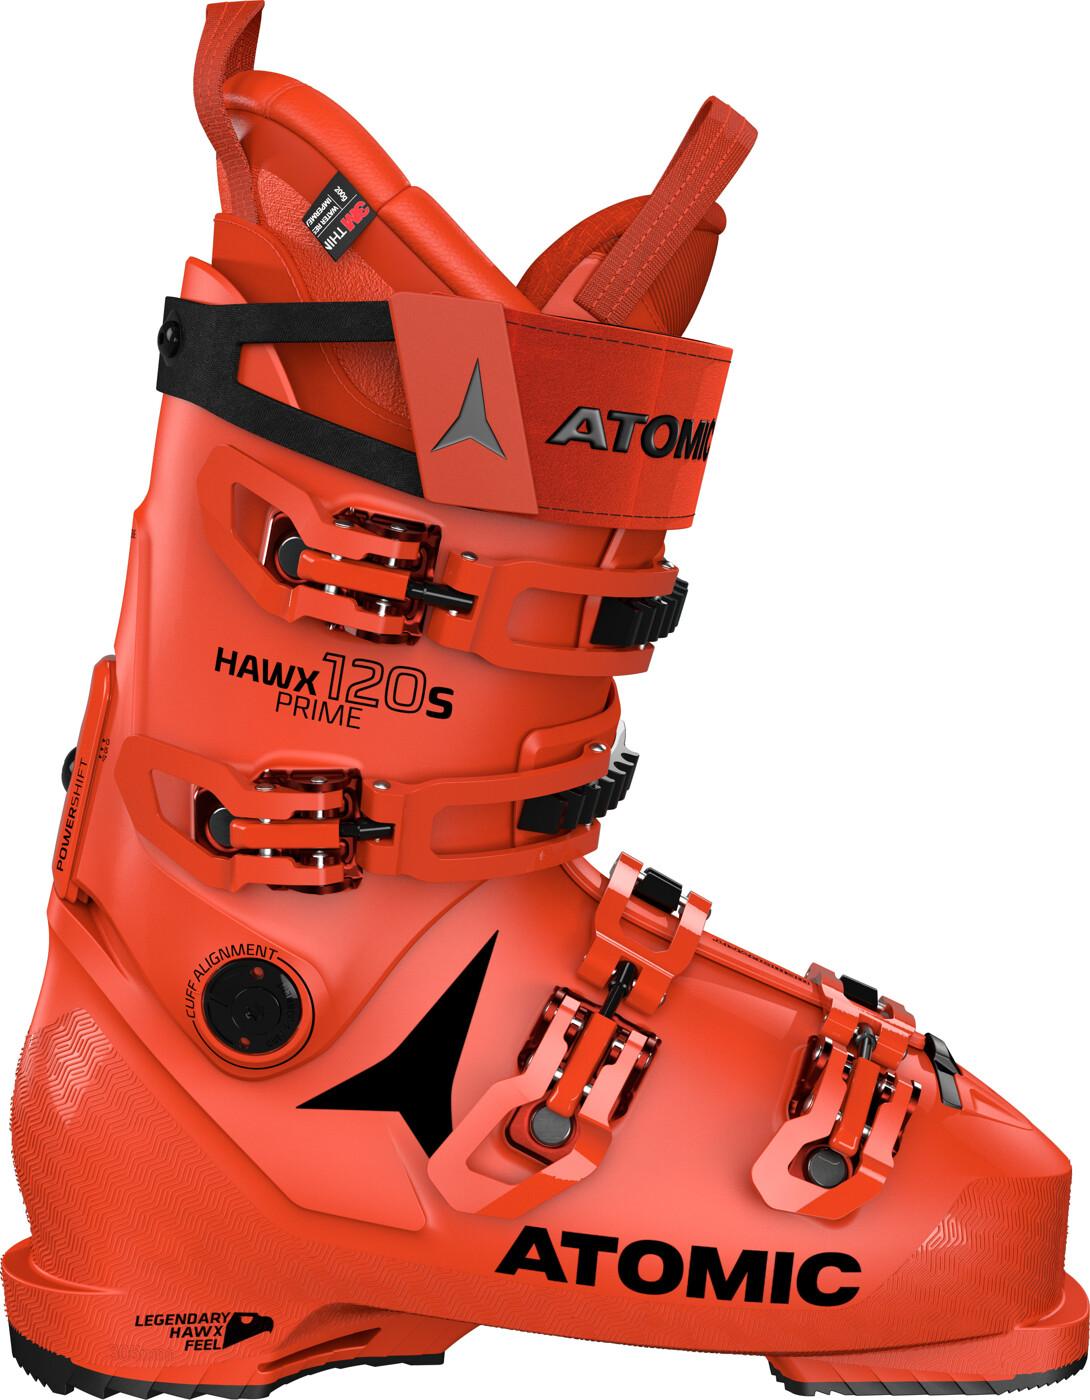 ATOMIC HAWX PRIME 120 S Red/Black - Herren